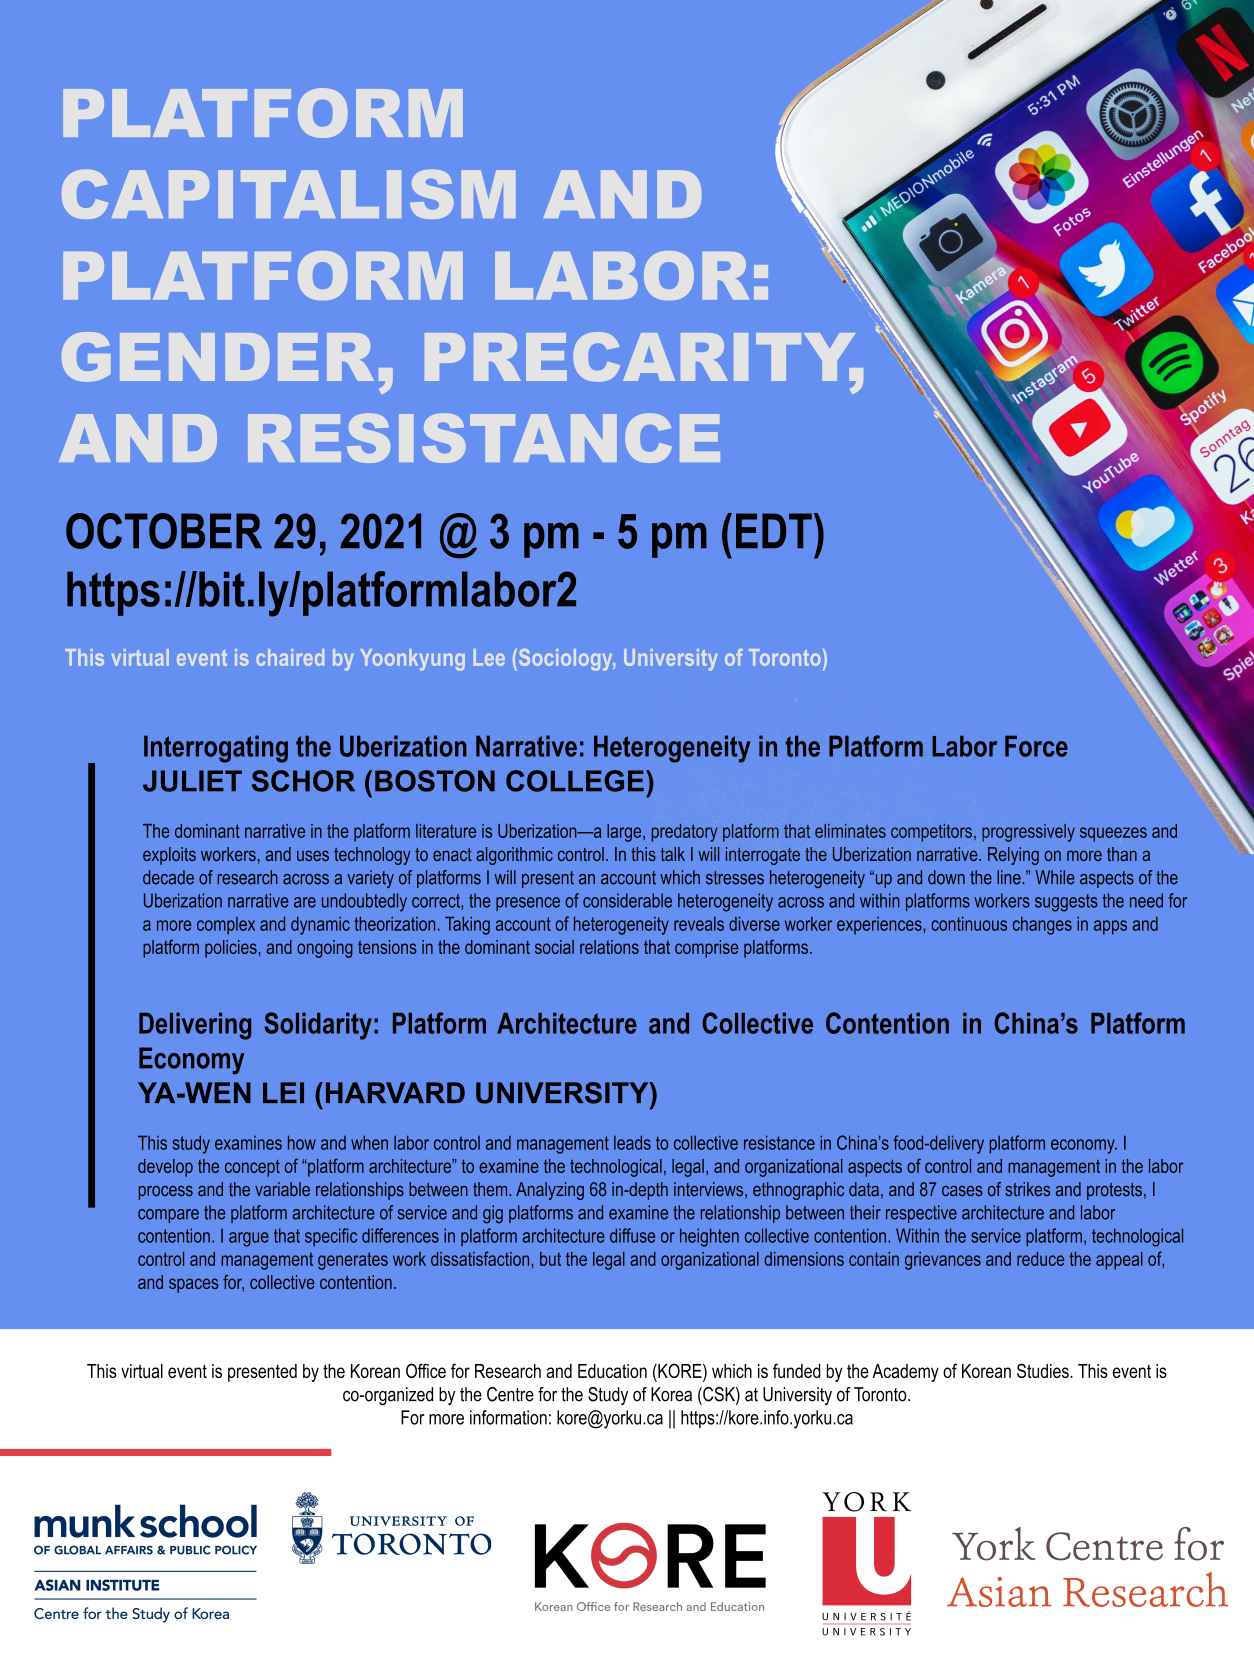 Platform Capitalism and Platform Labor: Gender, Precarity, and Resistance Part 2